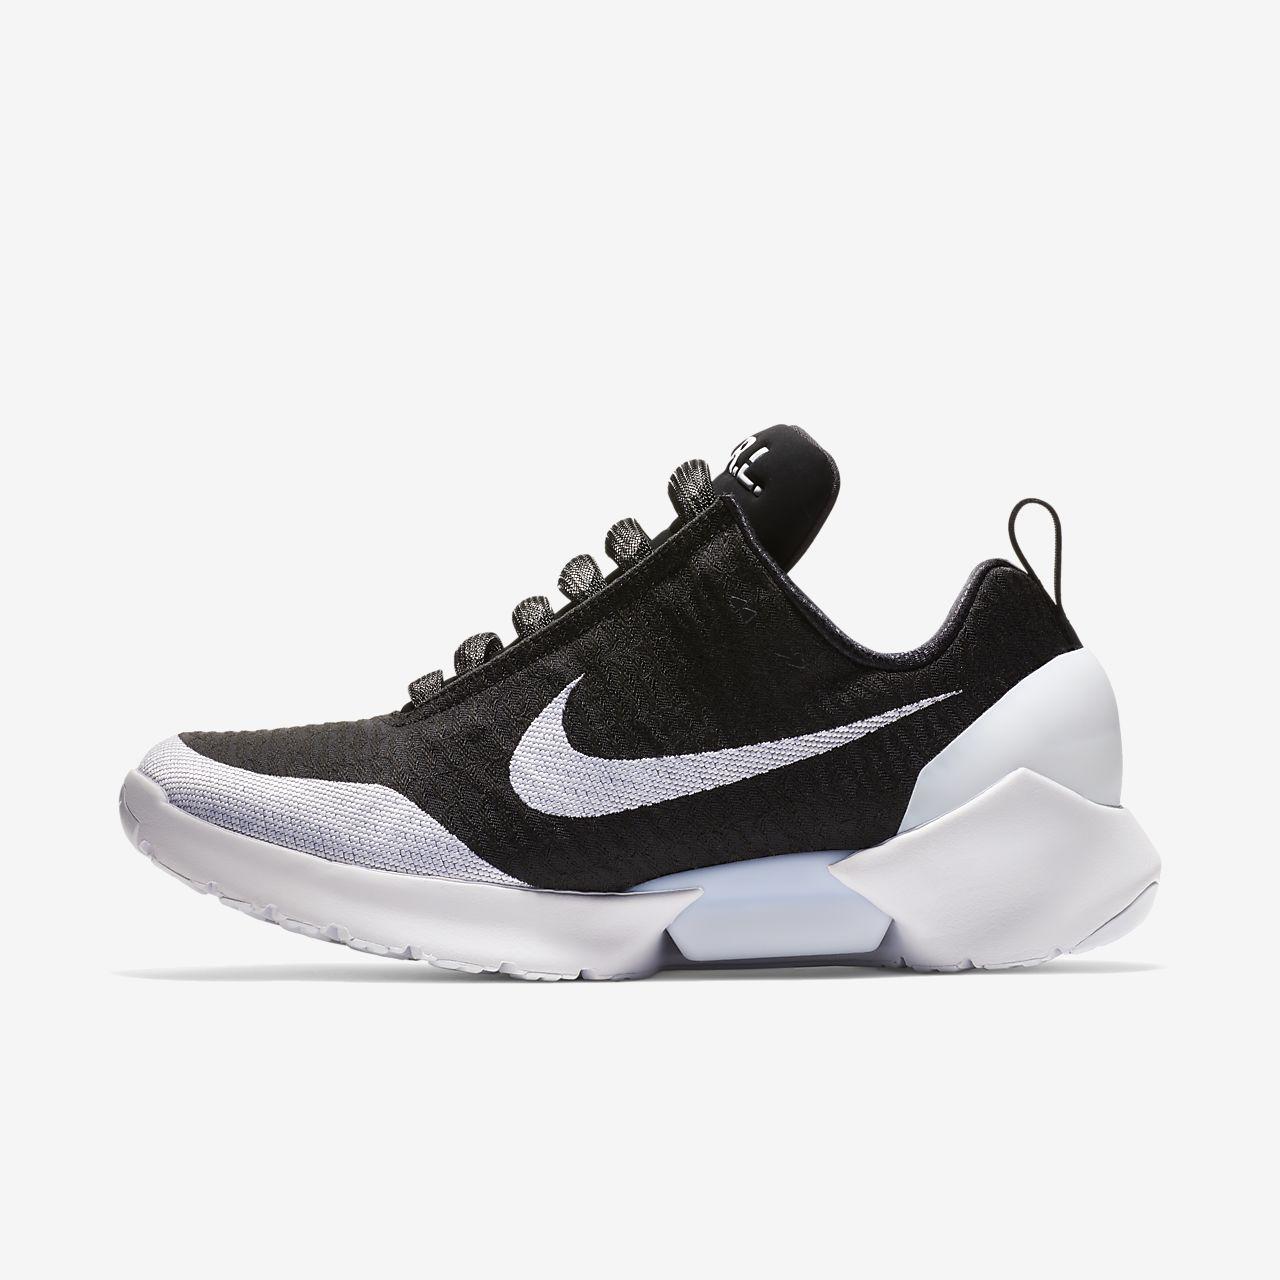 Scarpa 1 0spina Hyperadapt Nike EuUomoIt YfvygIb76m